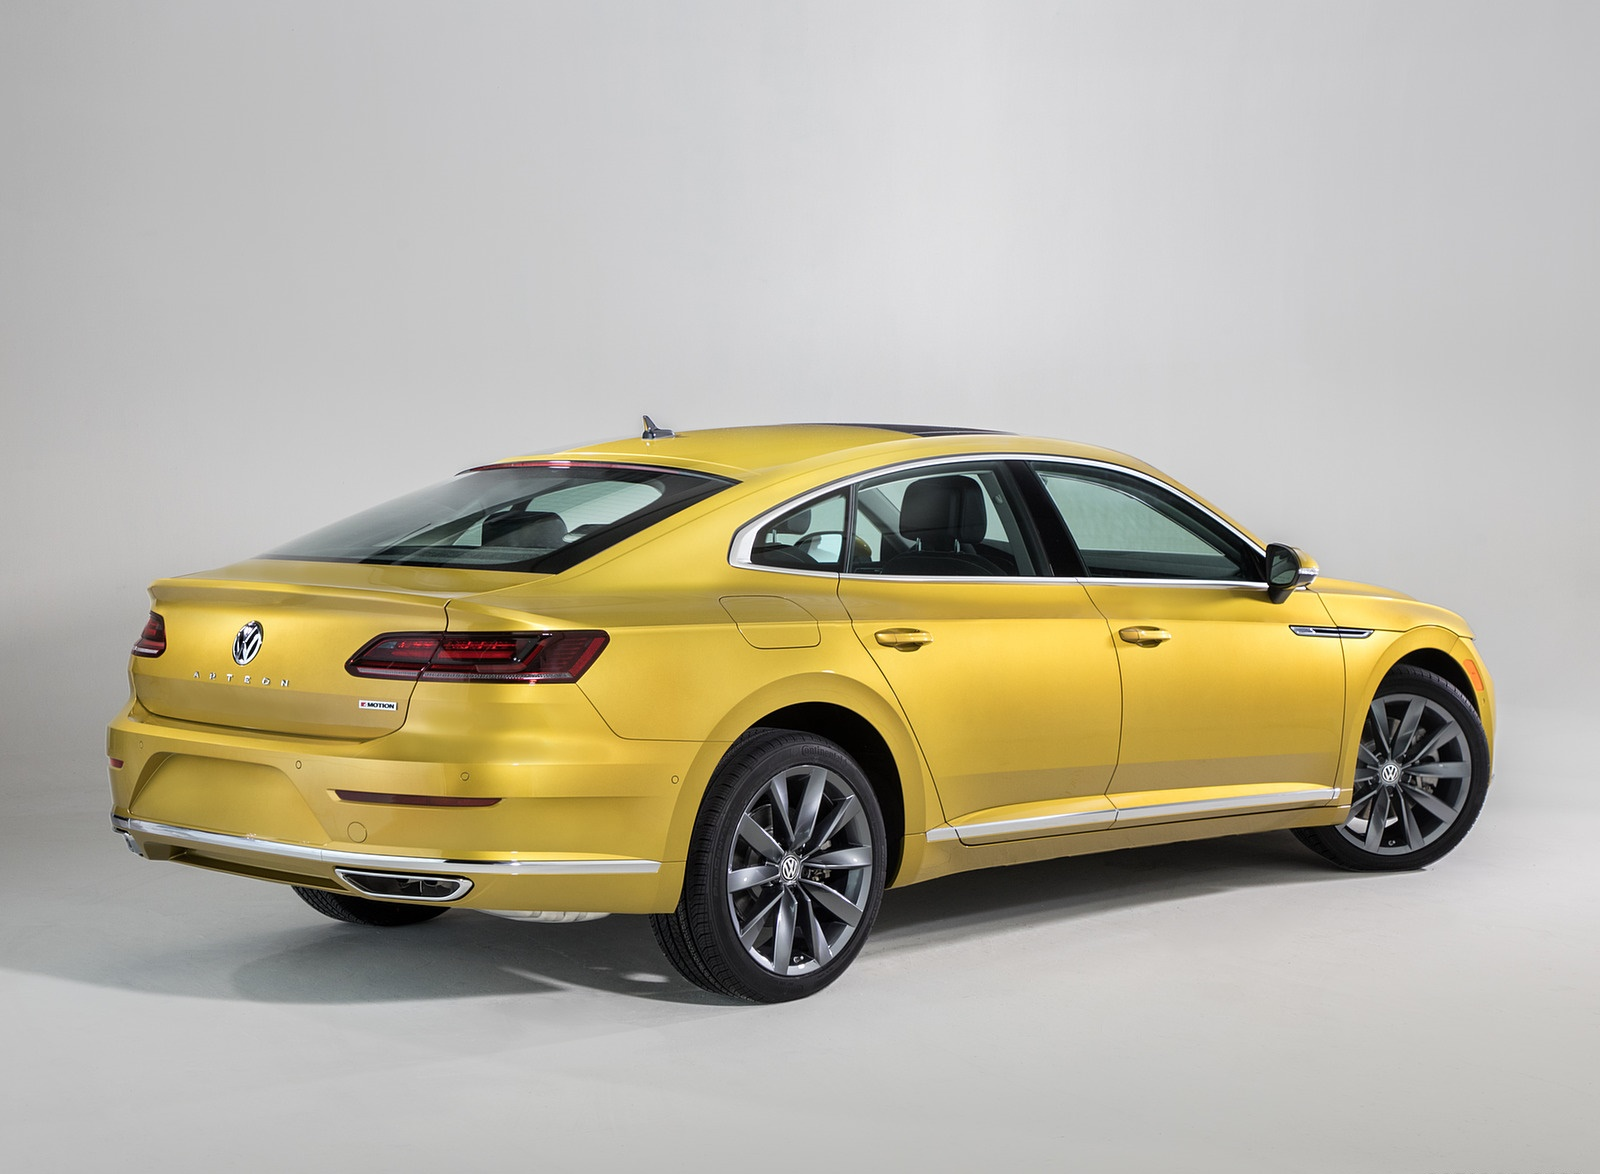 2019 Volkswagen Arteon (US-Spec) Rear Three-Quarter Wallpaper (13)